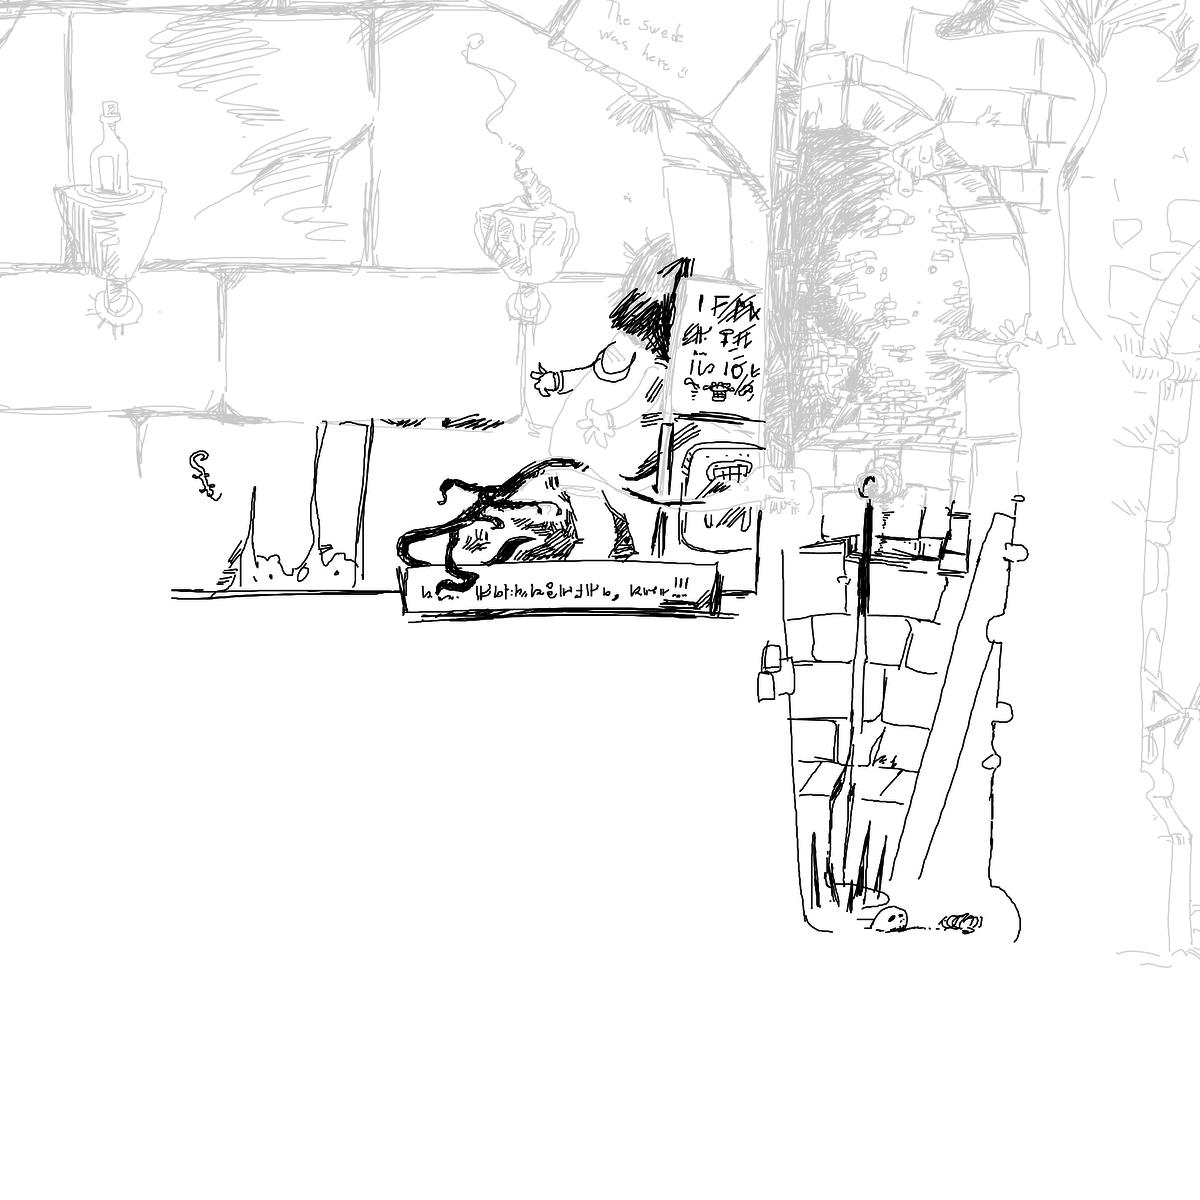 BAAAM drawing#6324 lat:78.4207305908203100lng: -4.4901008605957030